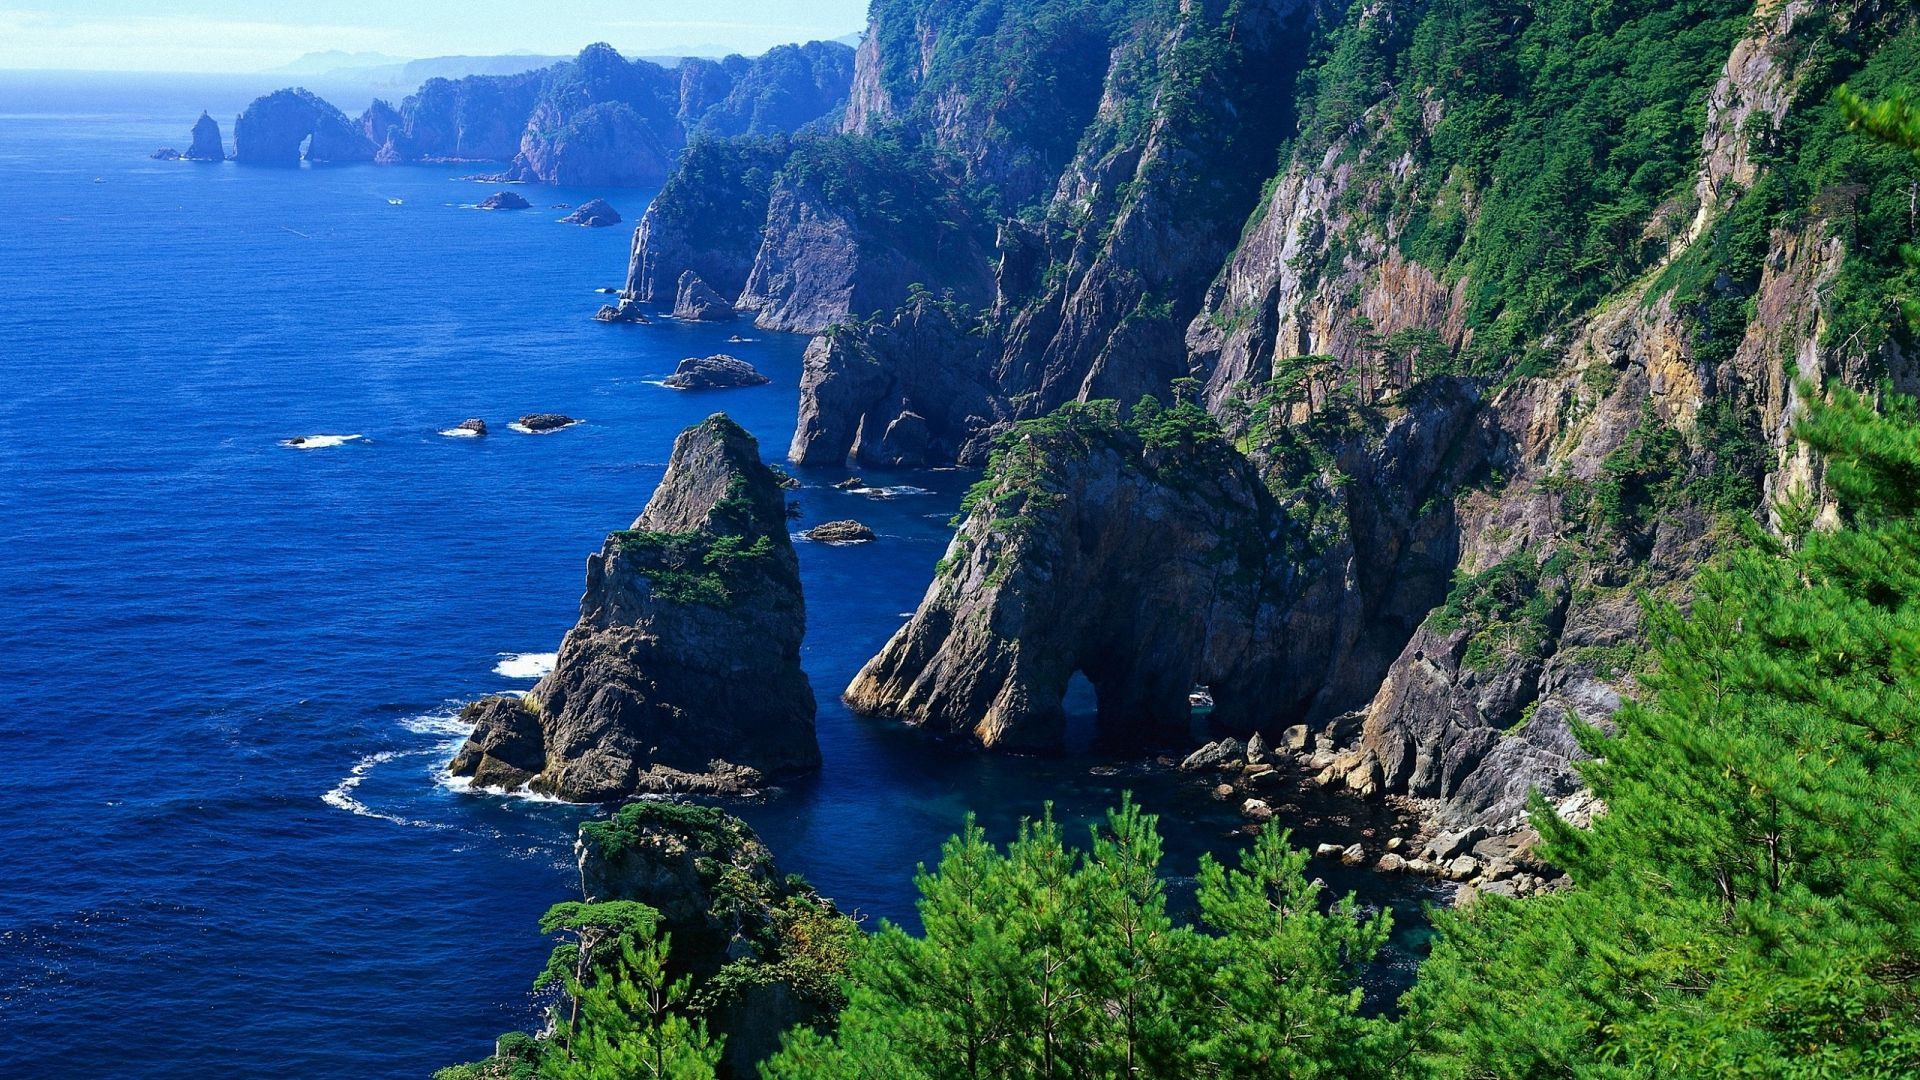 1920x1080 Sea Ocean Mountains Hd Wallpapers 1080p Scenery Sea And Ocean Landscape Hd wallpaper sea coast mountains rocks